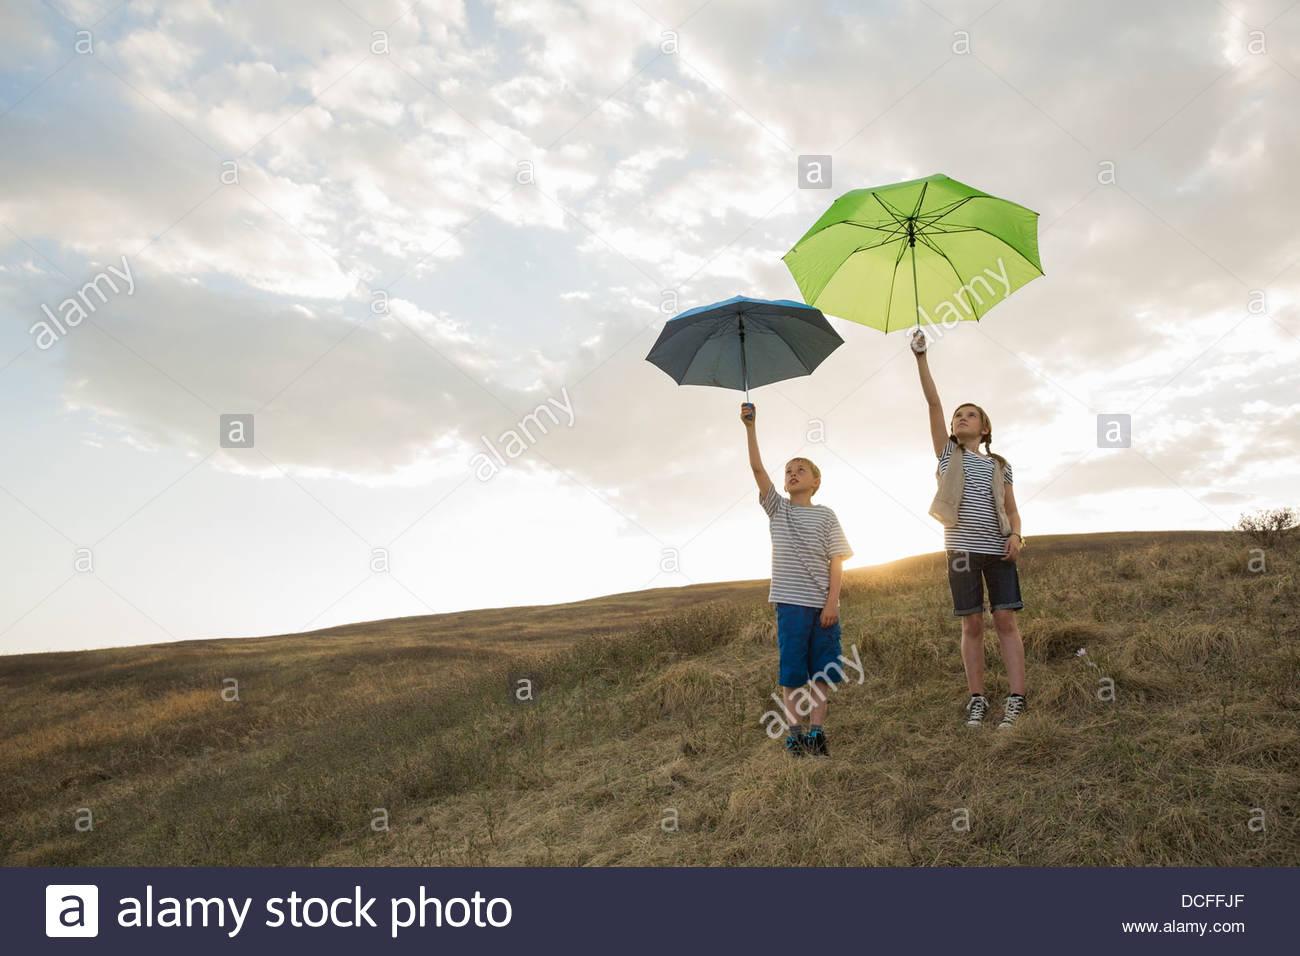 Kinder halten Sonnenschirme bis in den Himmel Stockbild